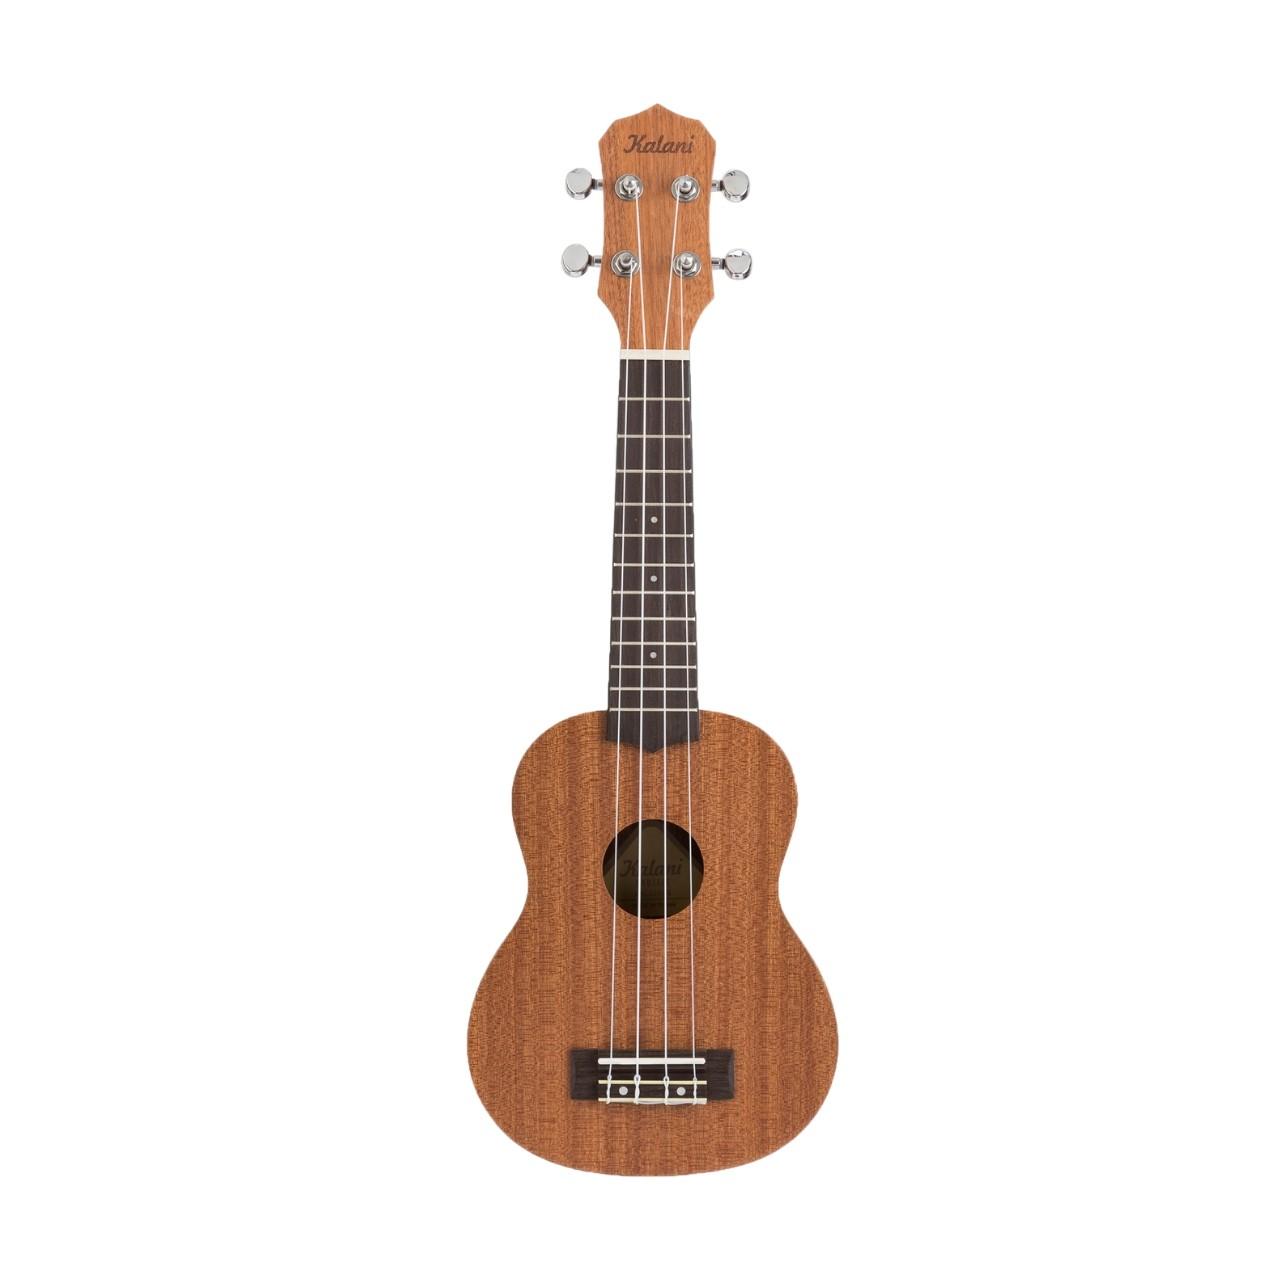 Ukulele Kalani Soprano Tribes Series KAL 220 SS Natural C/Capa  - Luggi Instrumentos Musicais